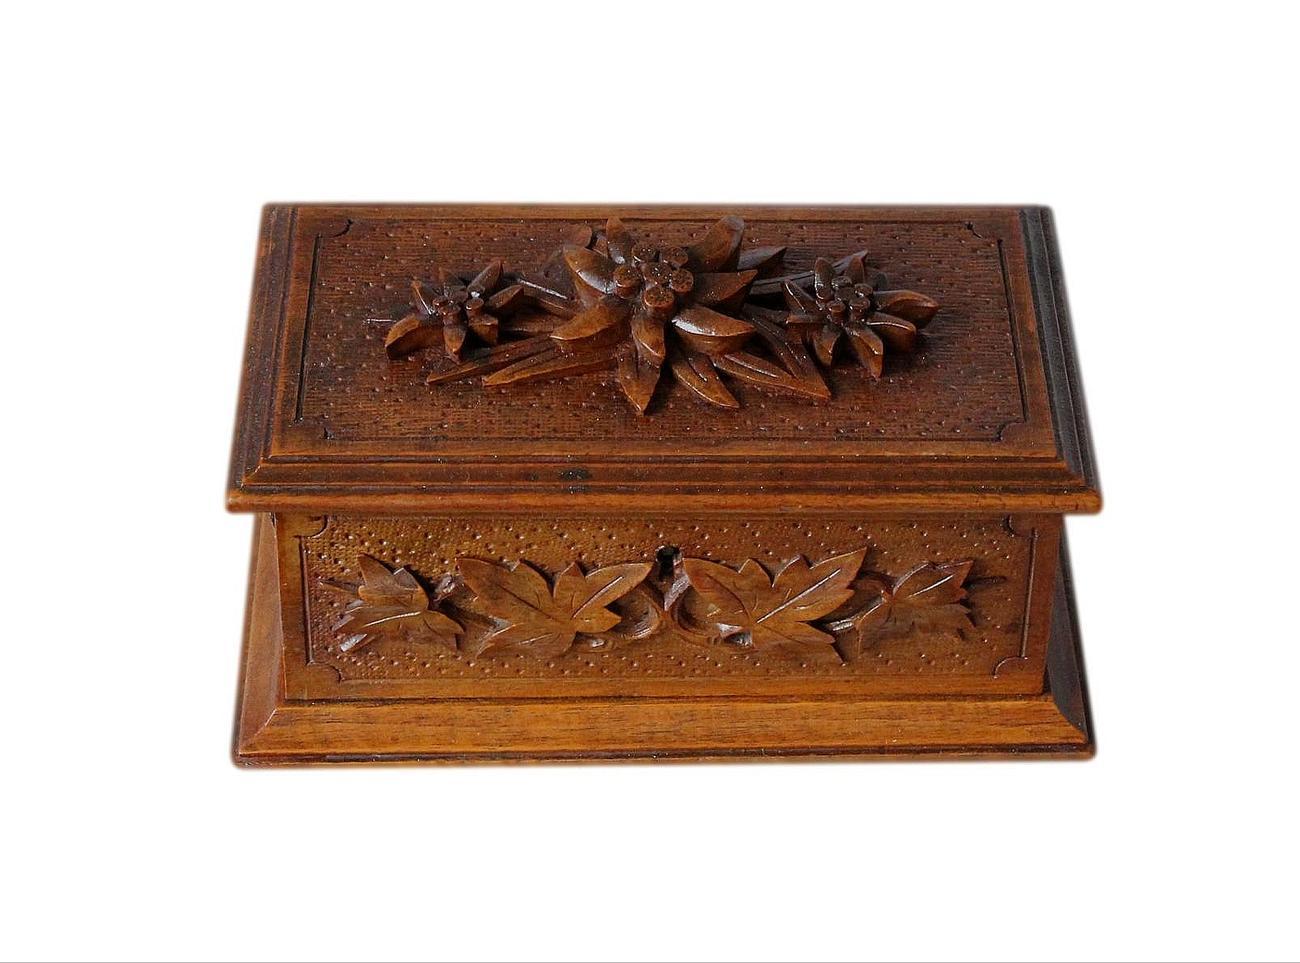 Vintage_Carved_Black_Forest_Jewellery_Box.jpg